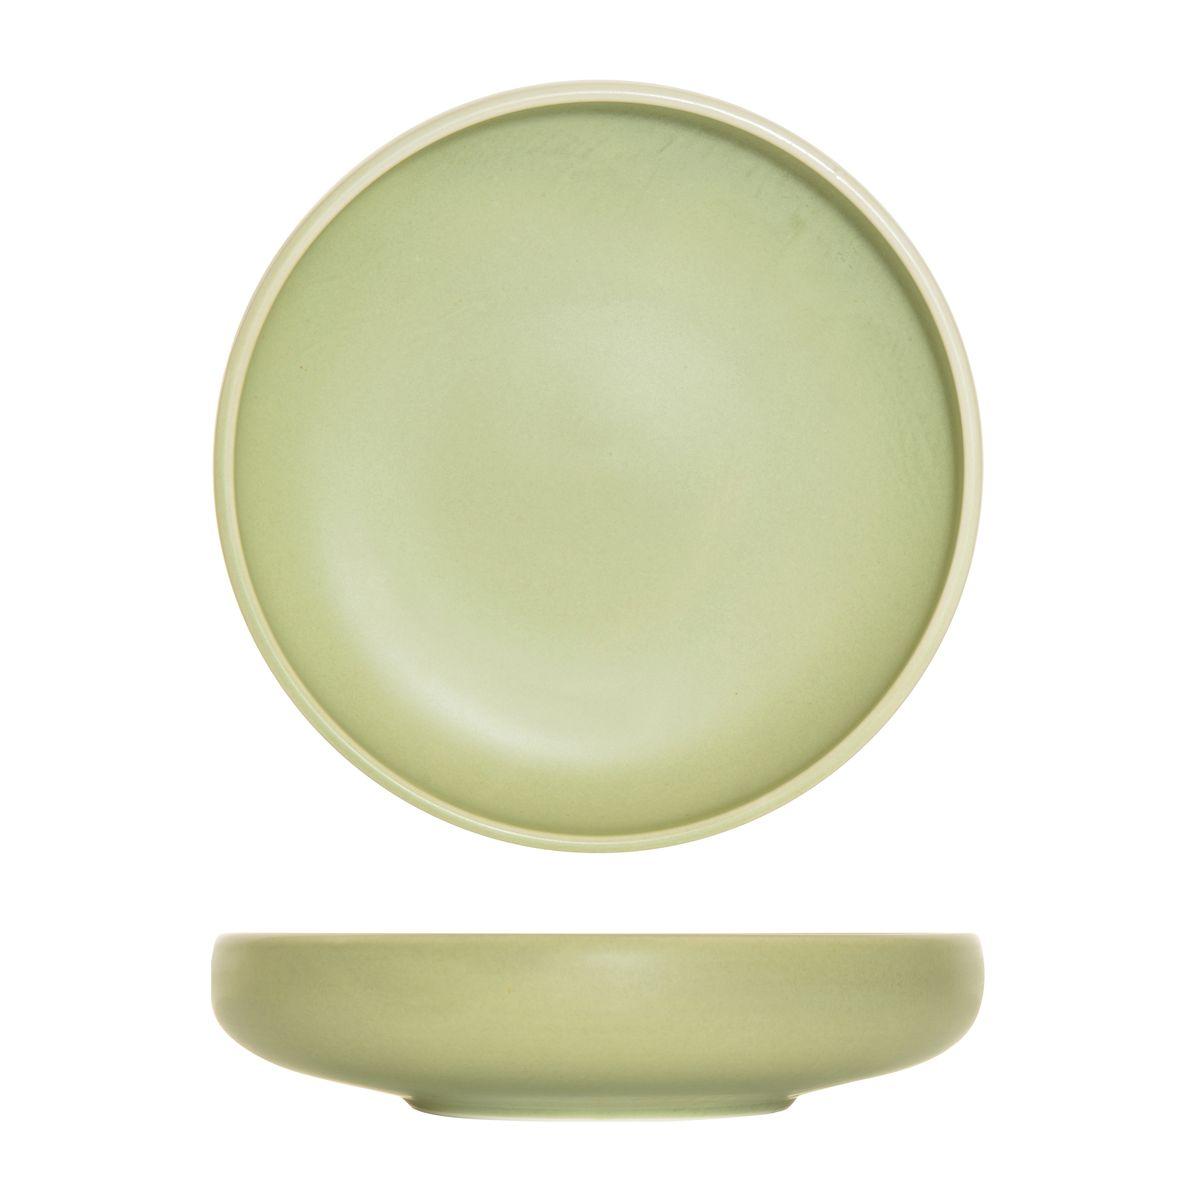 Moda Porcelain Lush Round Share Bowl 555/926960